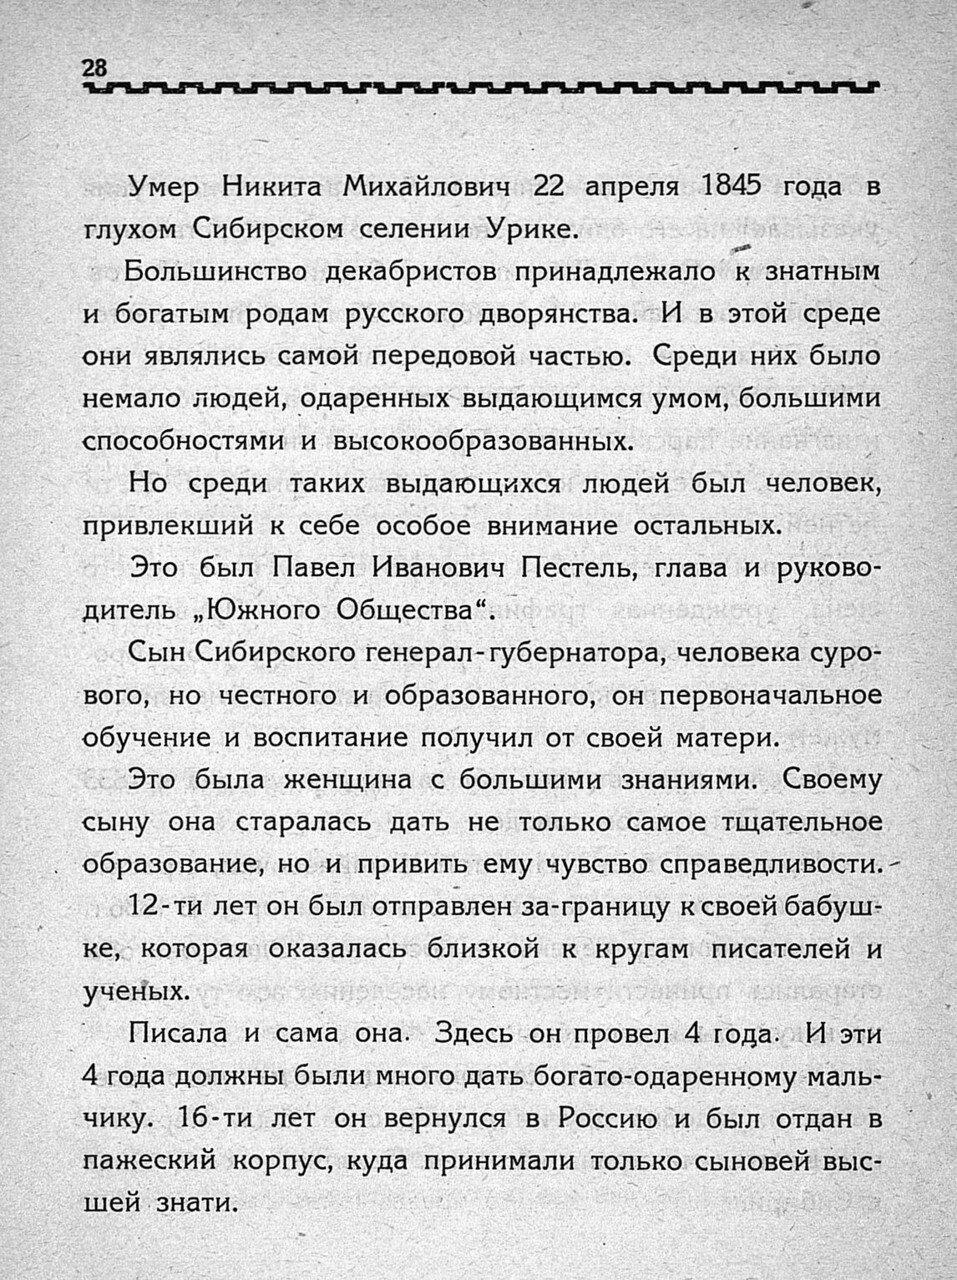 https://img-fotki.yandex.ru/get/112407/199368979.23/0_1bfae0_f85e608b_XXXL.jpg